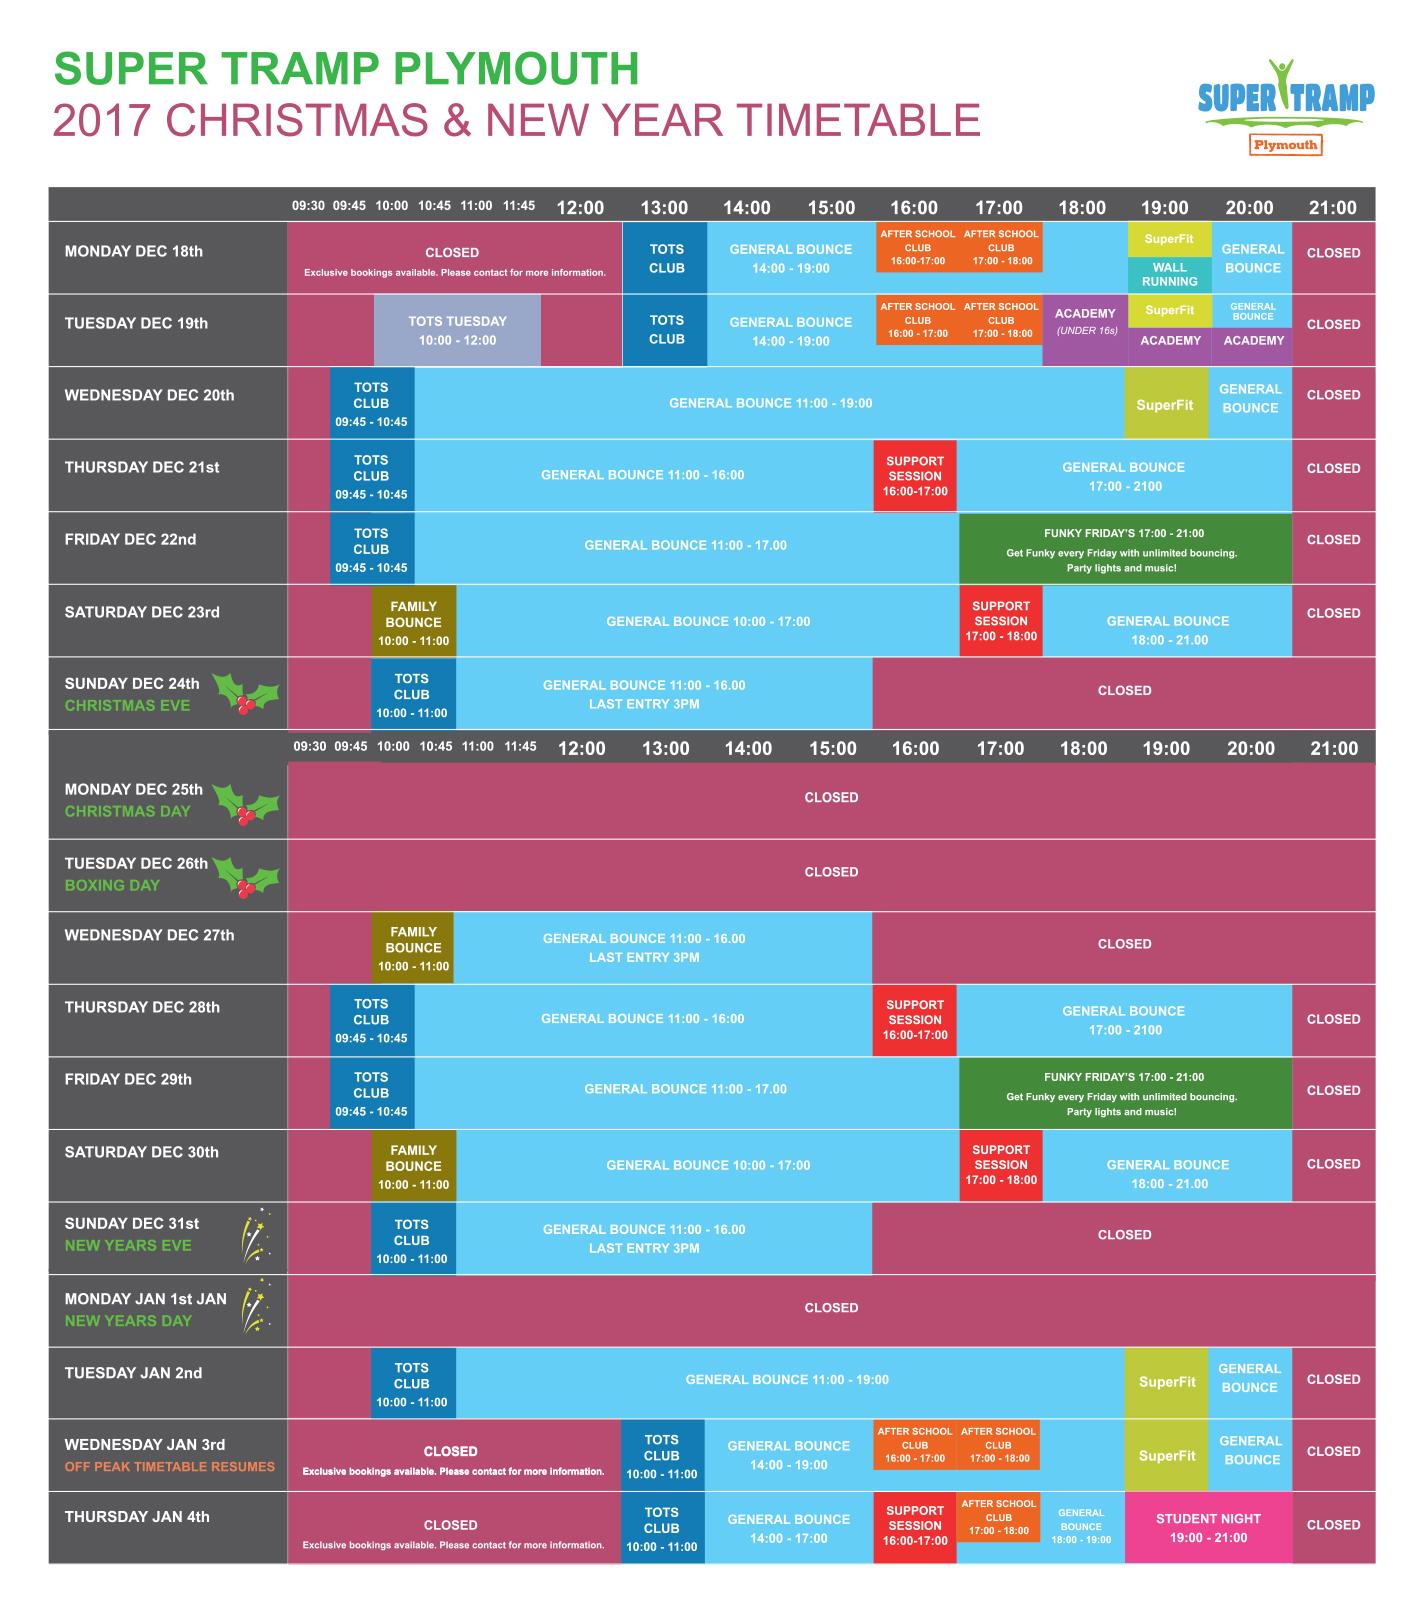 xmas_2017_timetable-6.jpg